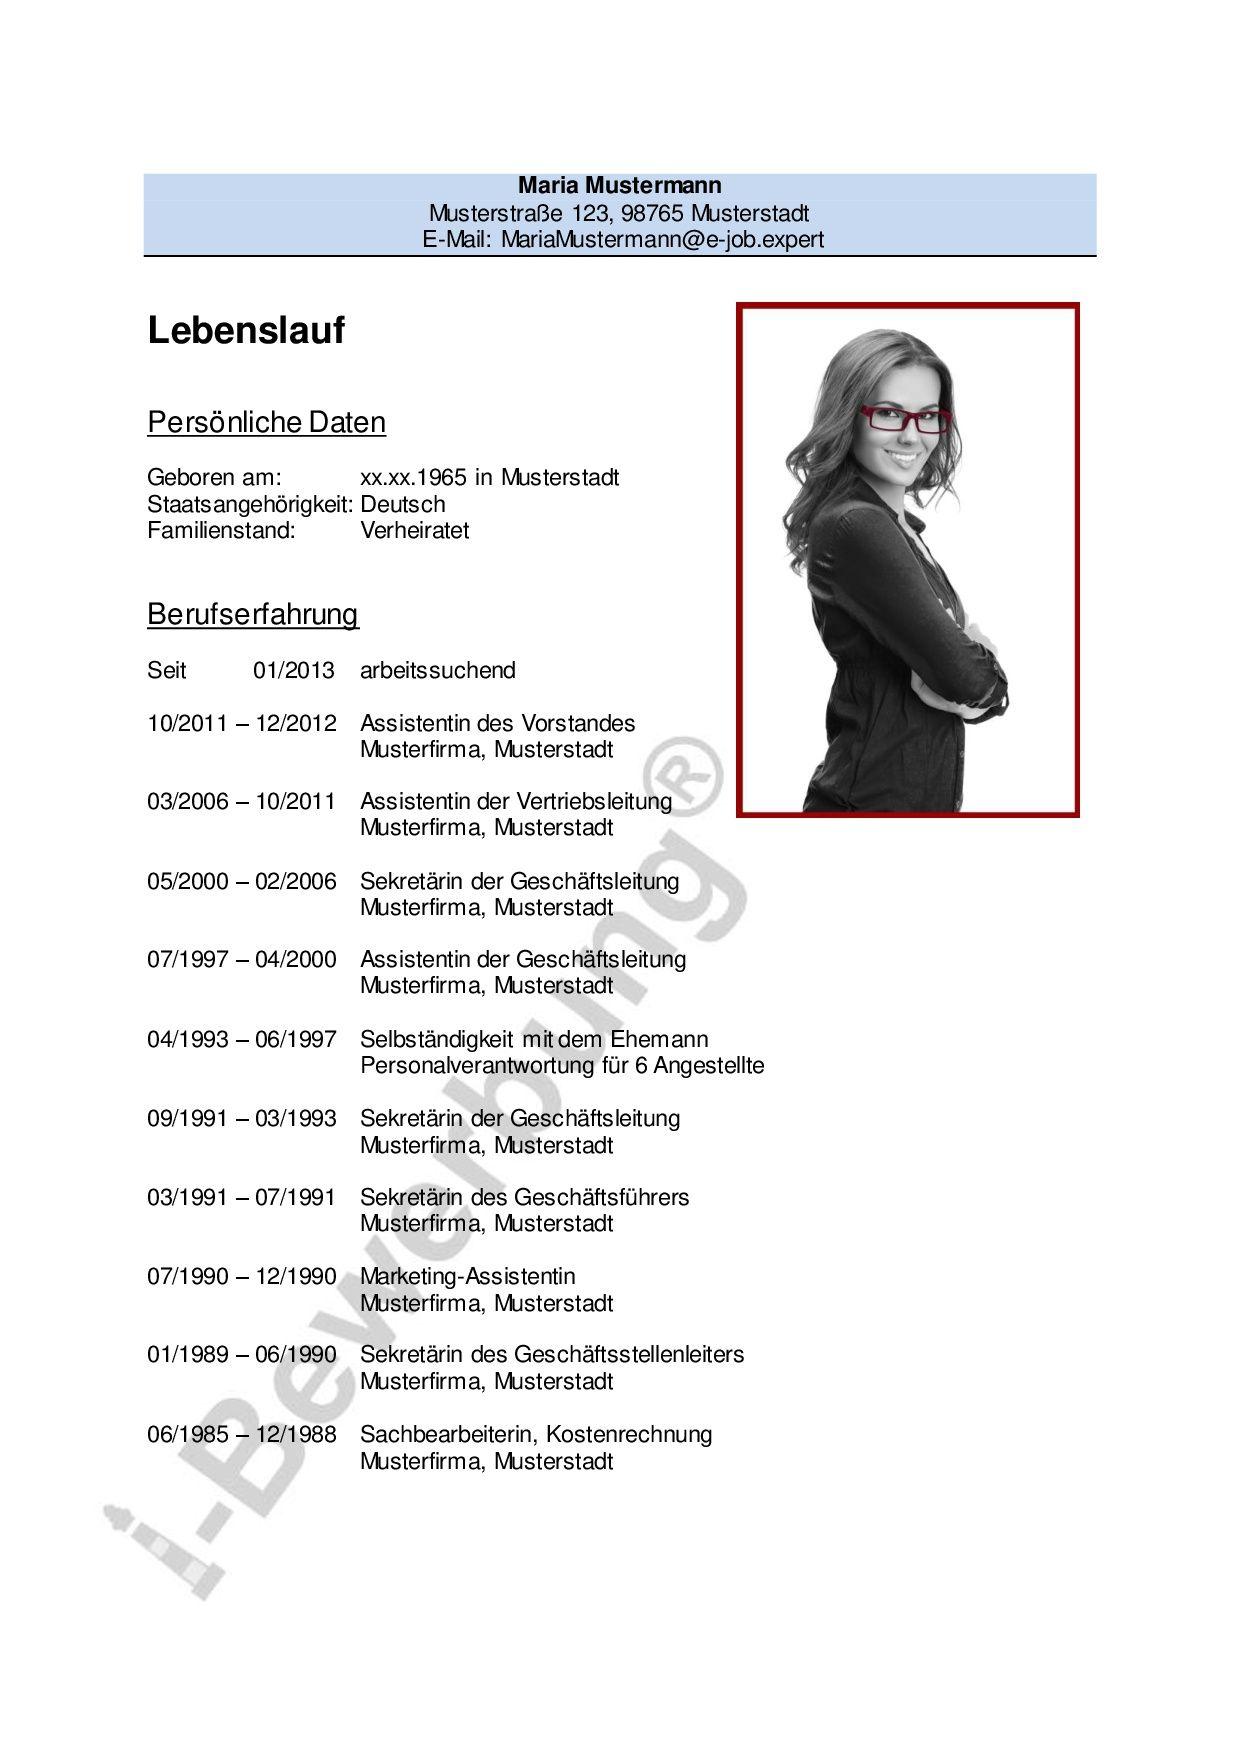 Fein Lebenslauf Marketing Assistent Bilder - Entry Level Resume ...